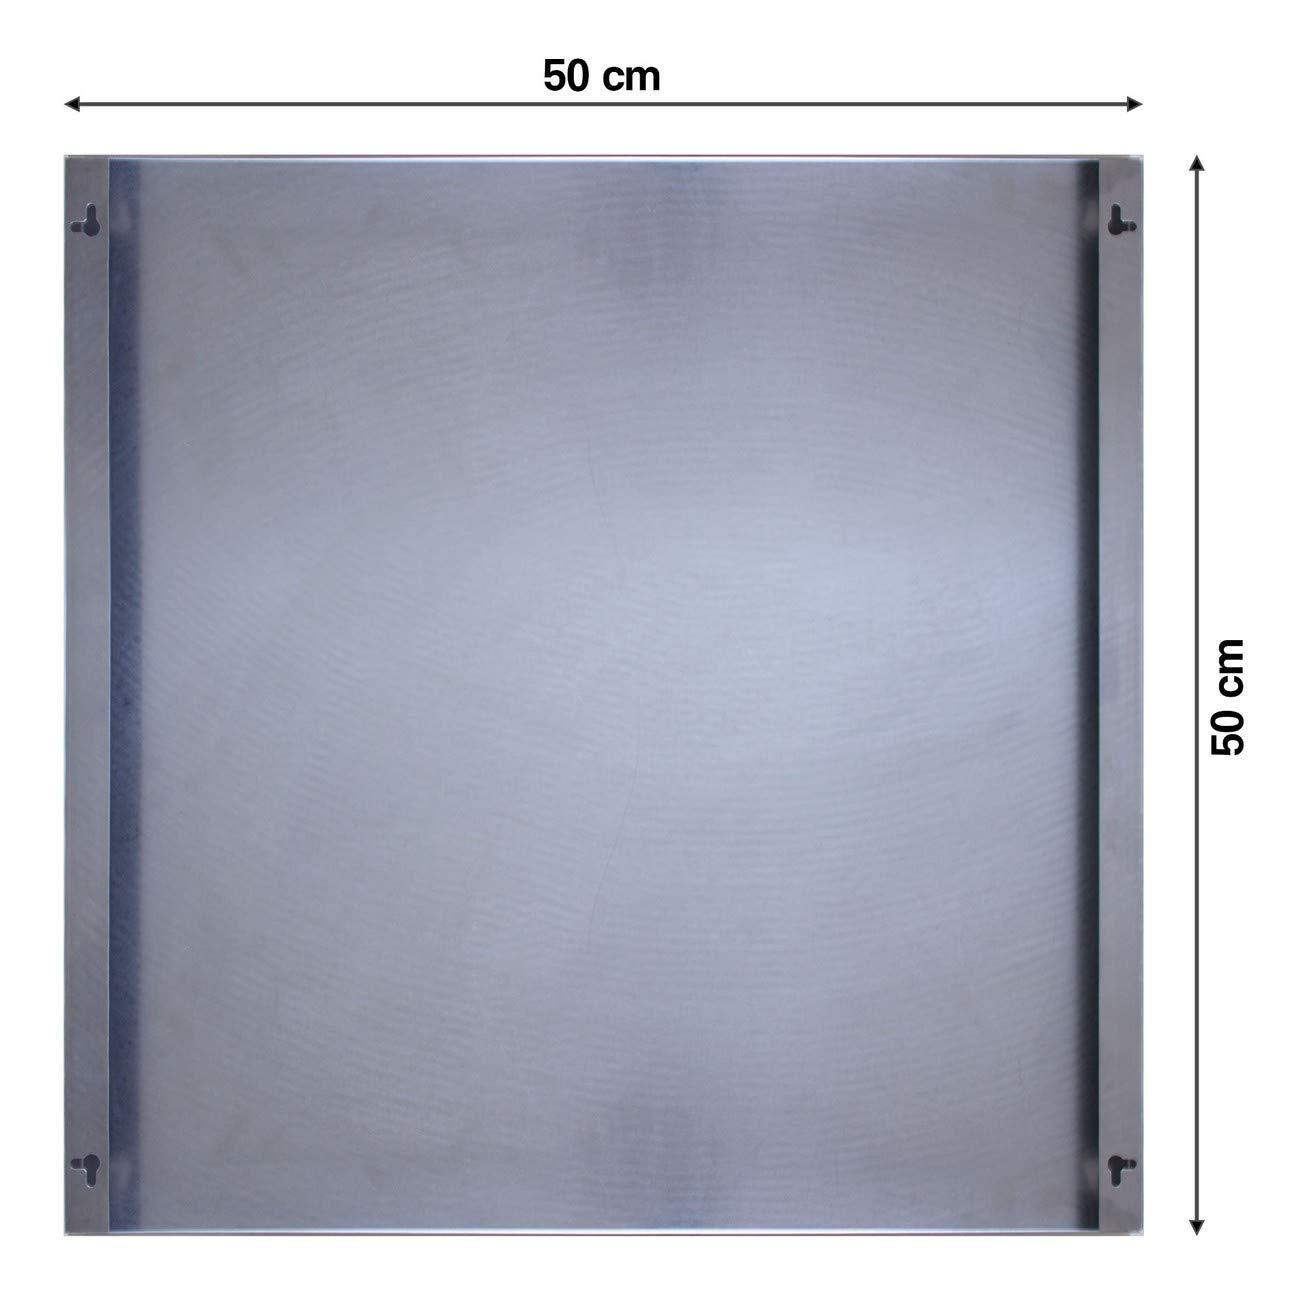 Memoboard magnetisch 50x50cm Pinnwand mit Motiv Pause banjado Magnettafel aus Edelstahl